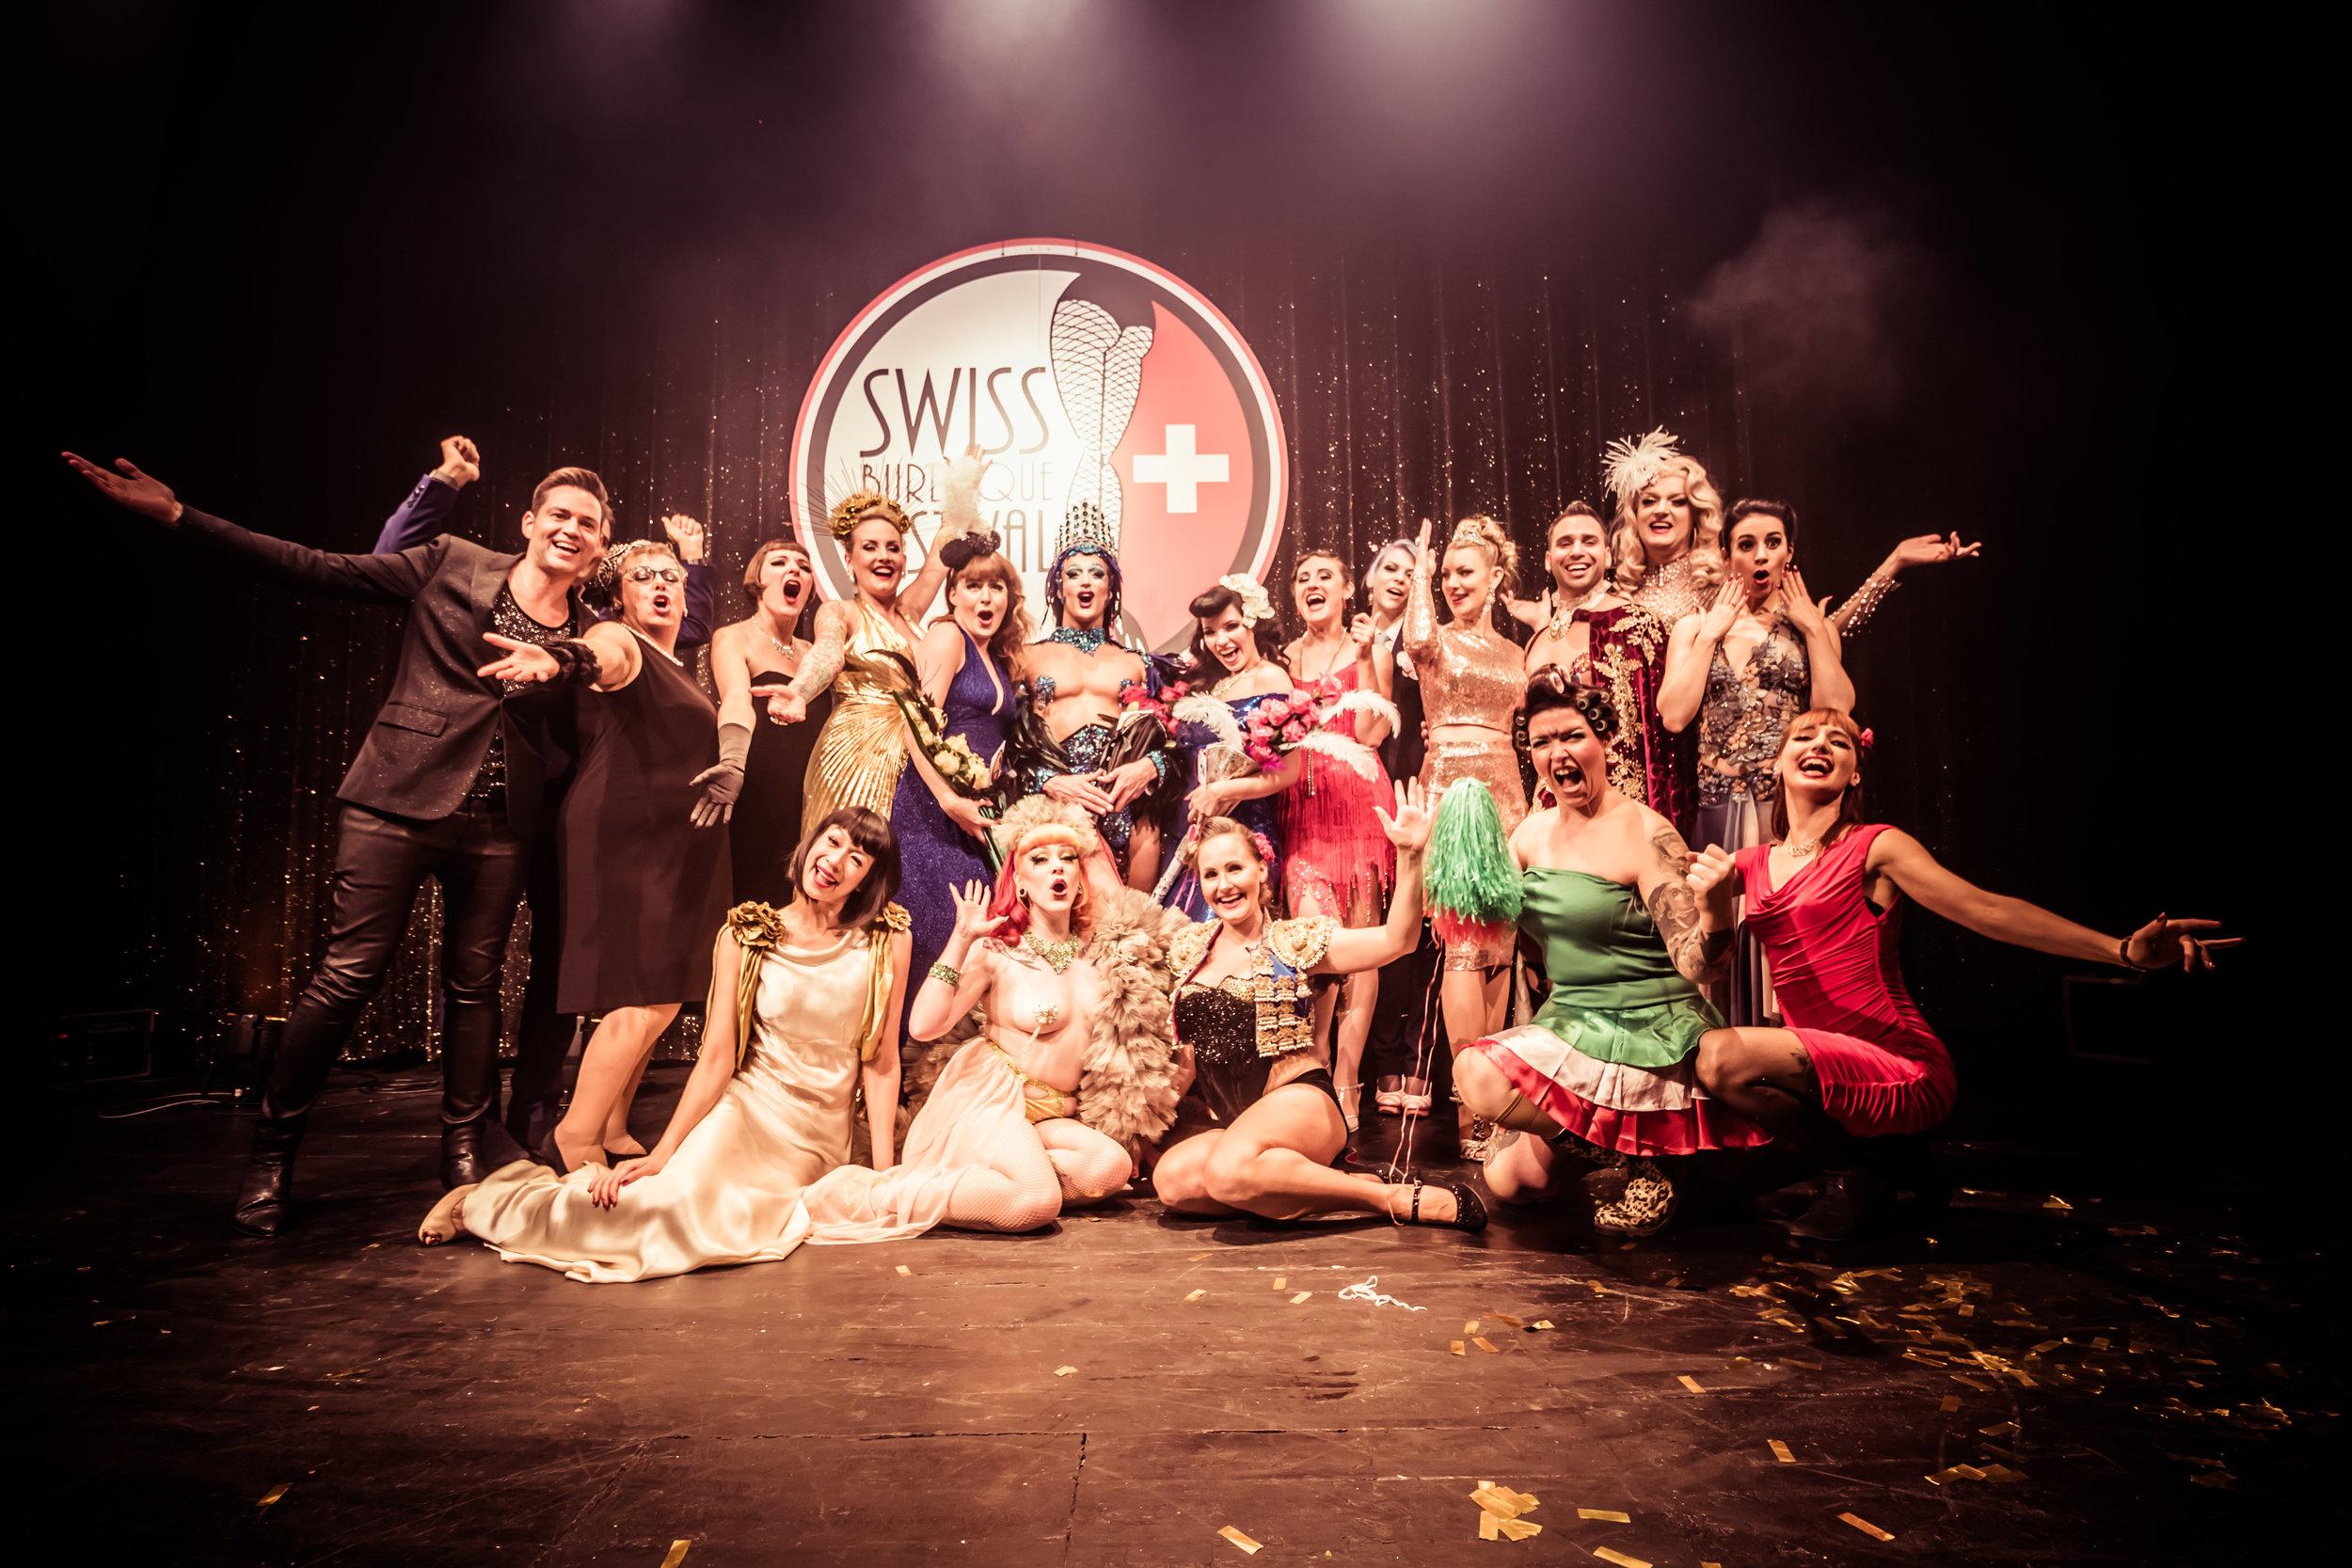 Swiss Burlesque Festival 2018 by Dirk Behlau-3515.jpg